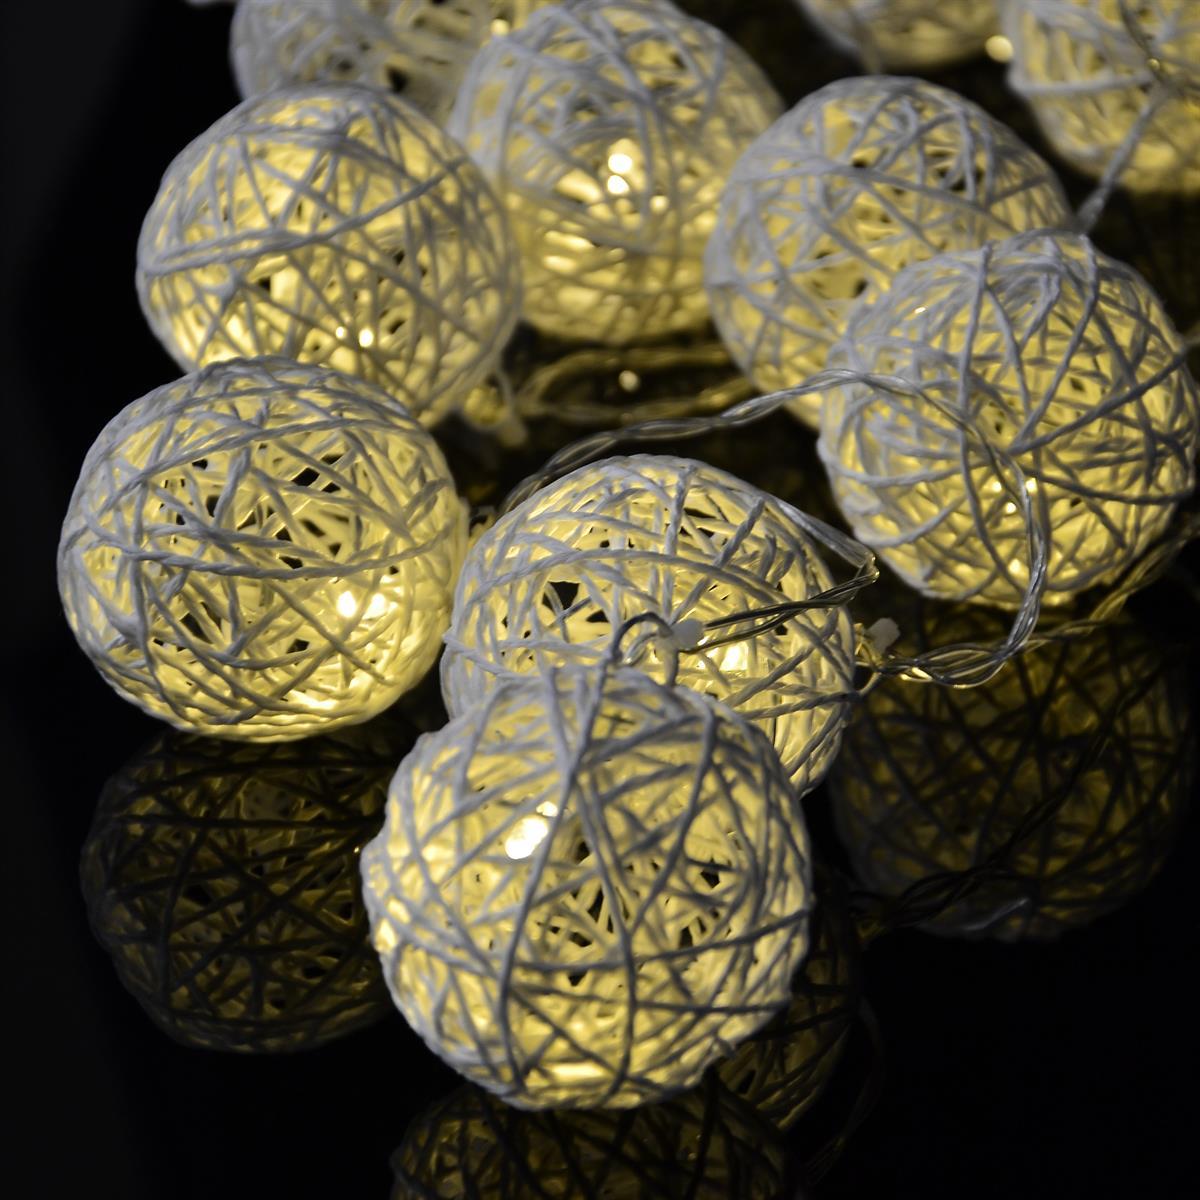 20 LED Lichterkette Ball in Rattanoptik weiß Batterie Kugel-Lichterkette Party